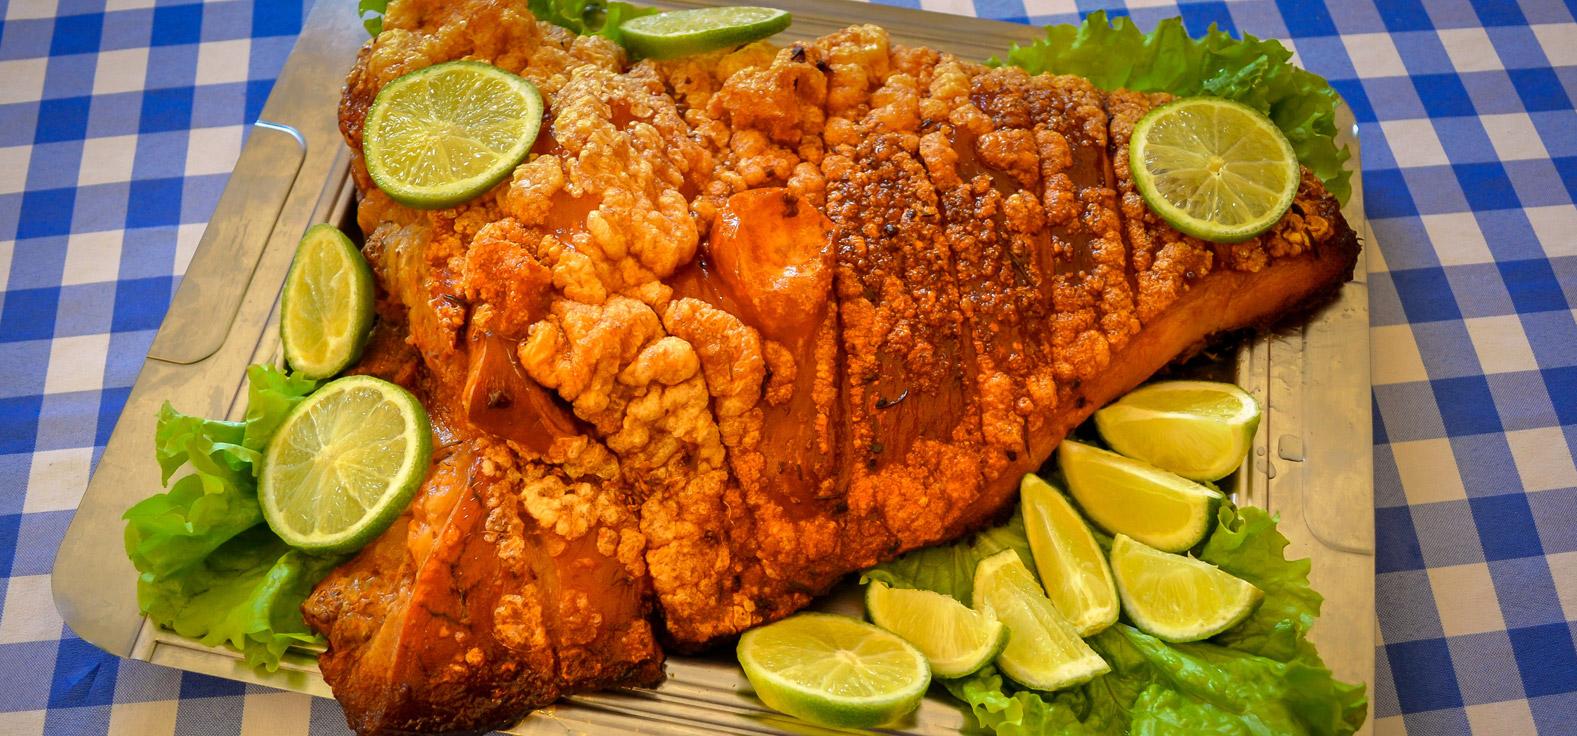 Pururuca do Restaurante Baddy em Corumbataí | Portal Serra do Itaquerí